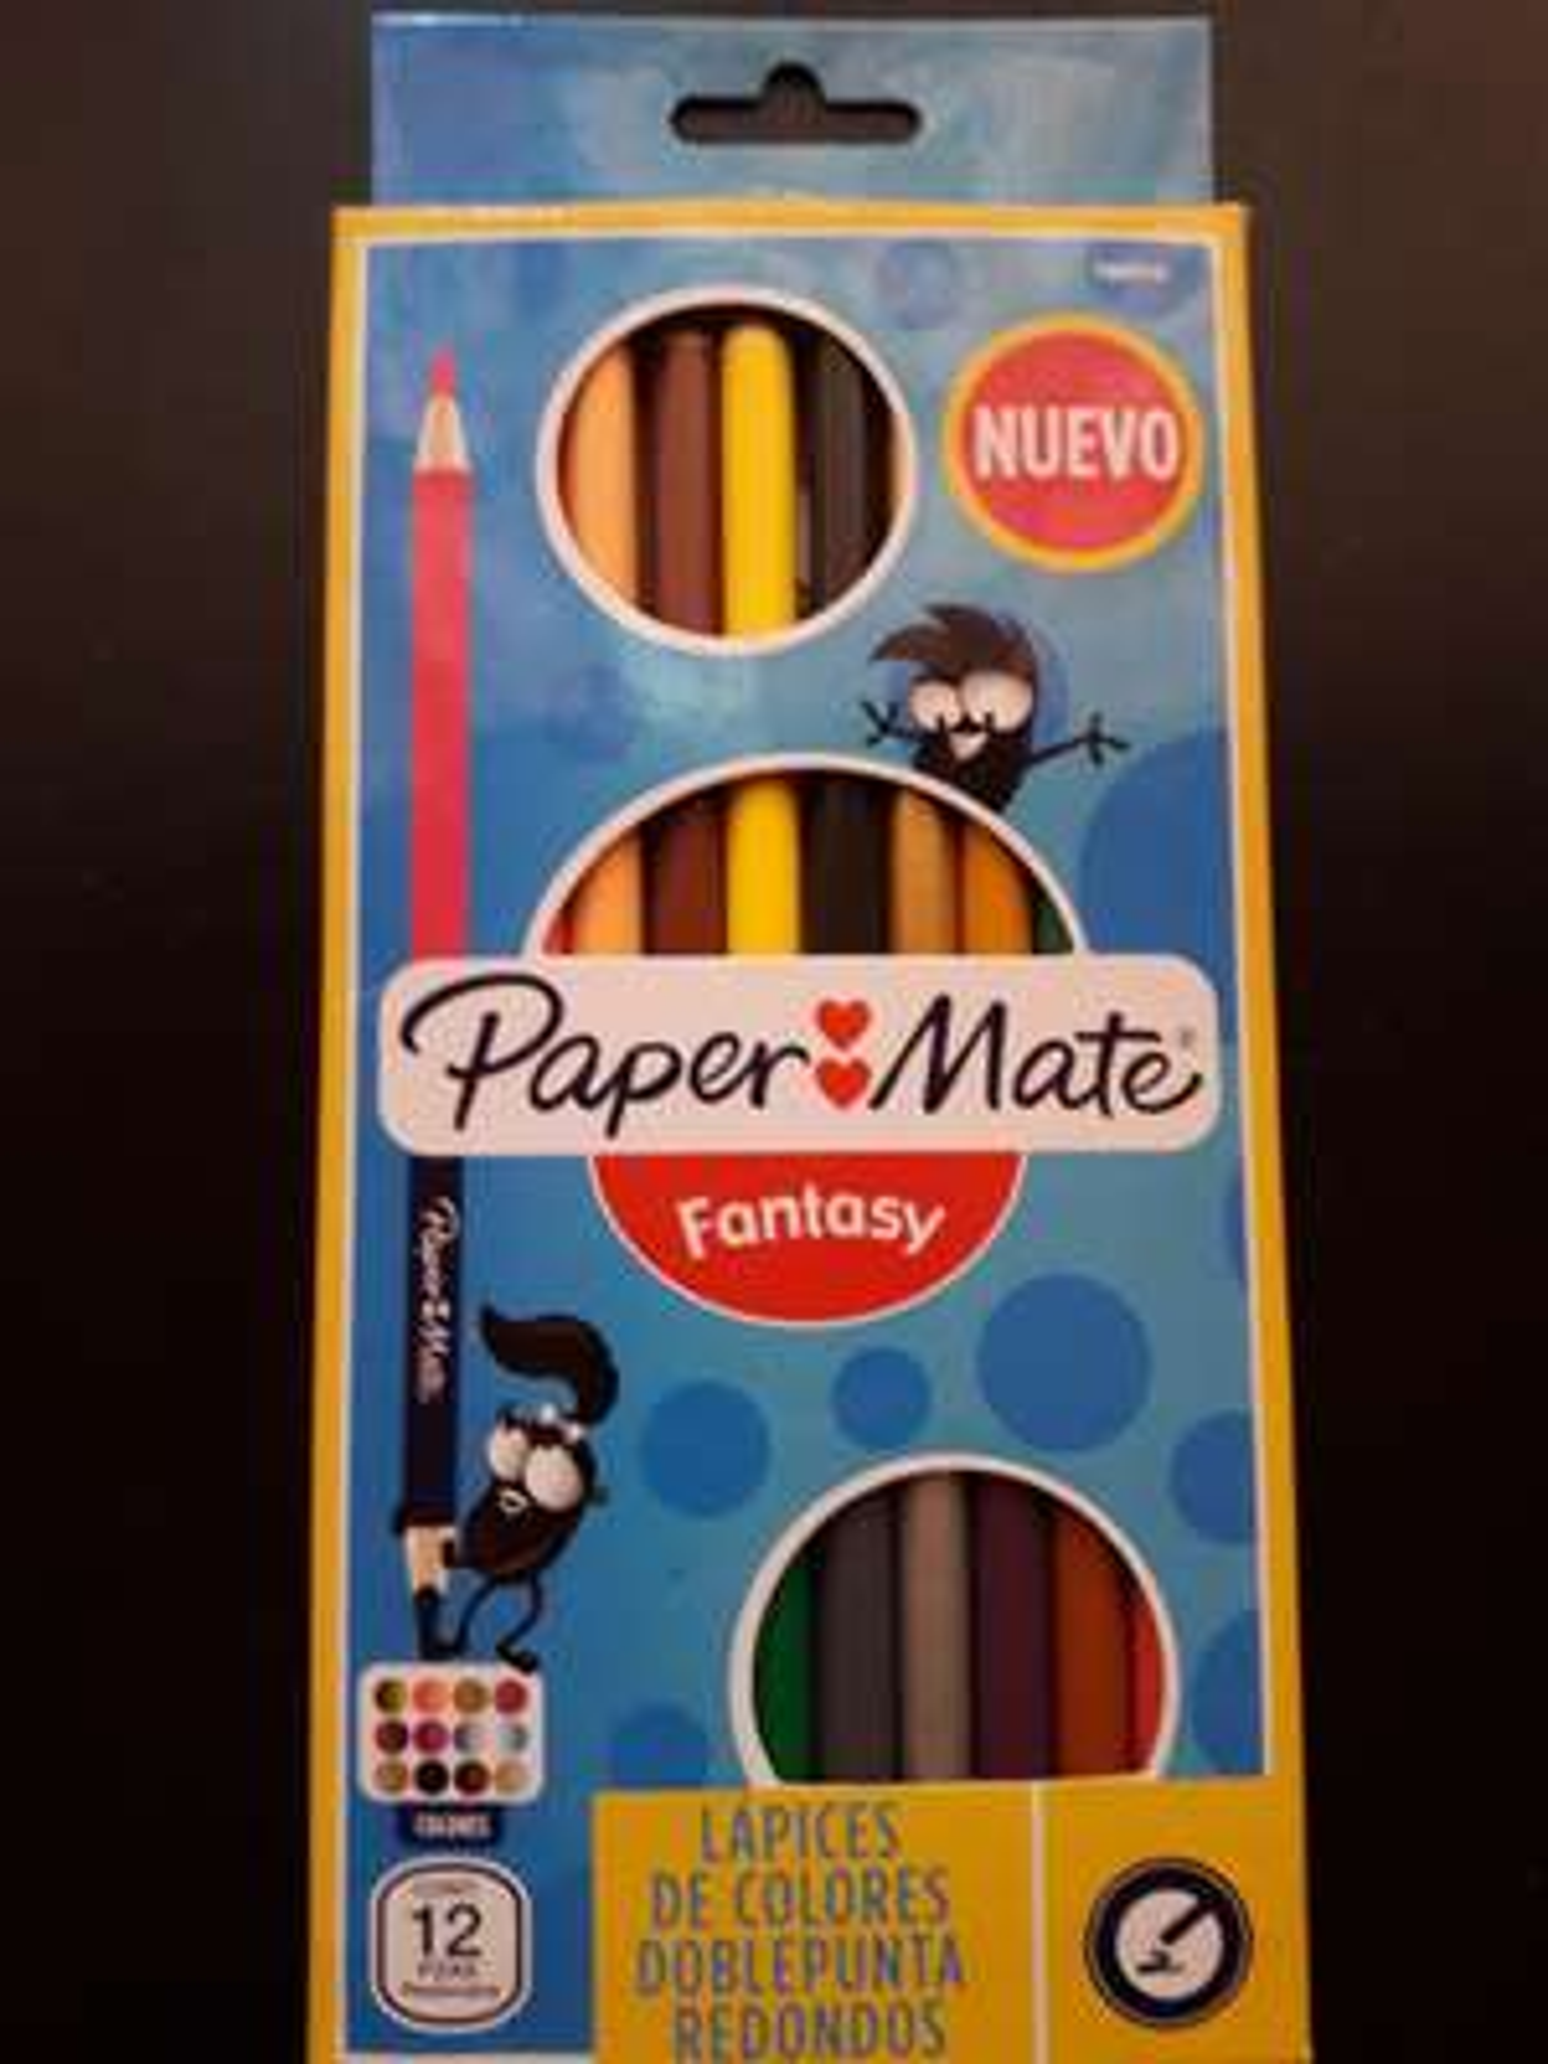 Bodega Aurrerá: Texcoco: Colores paper mate